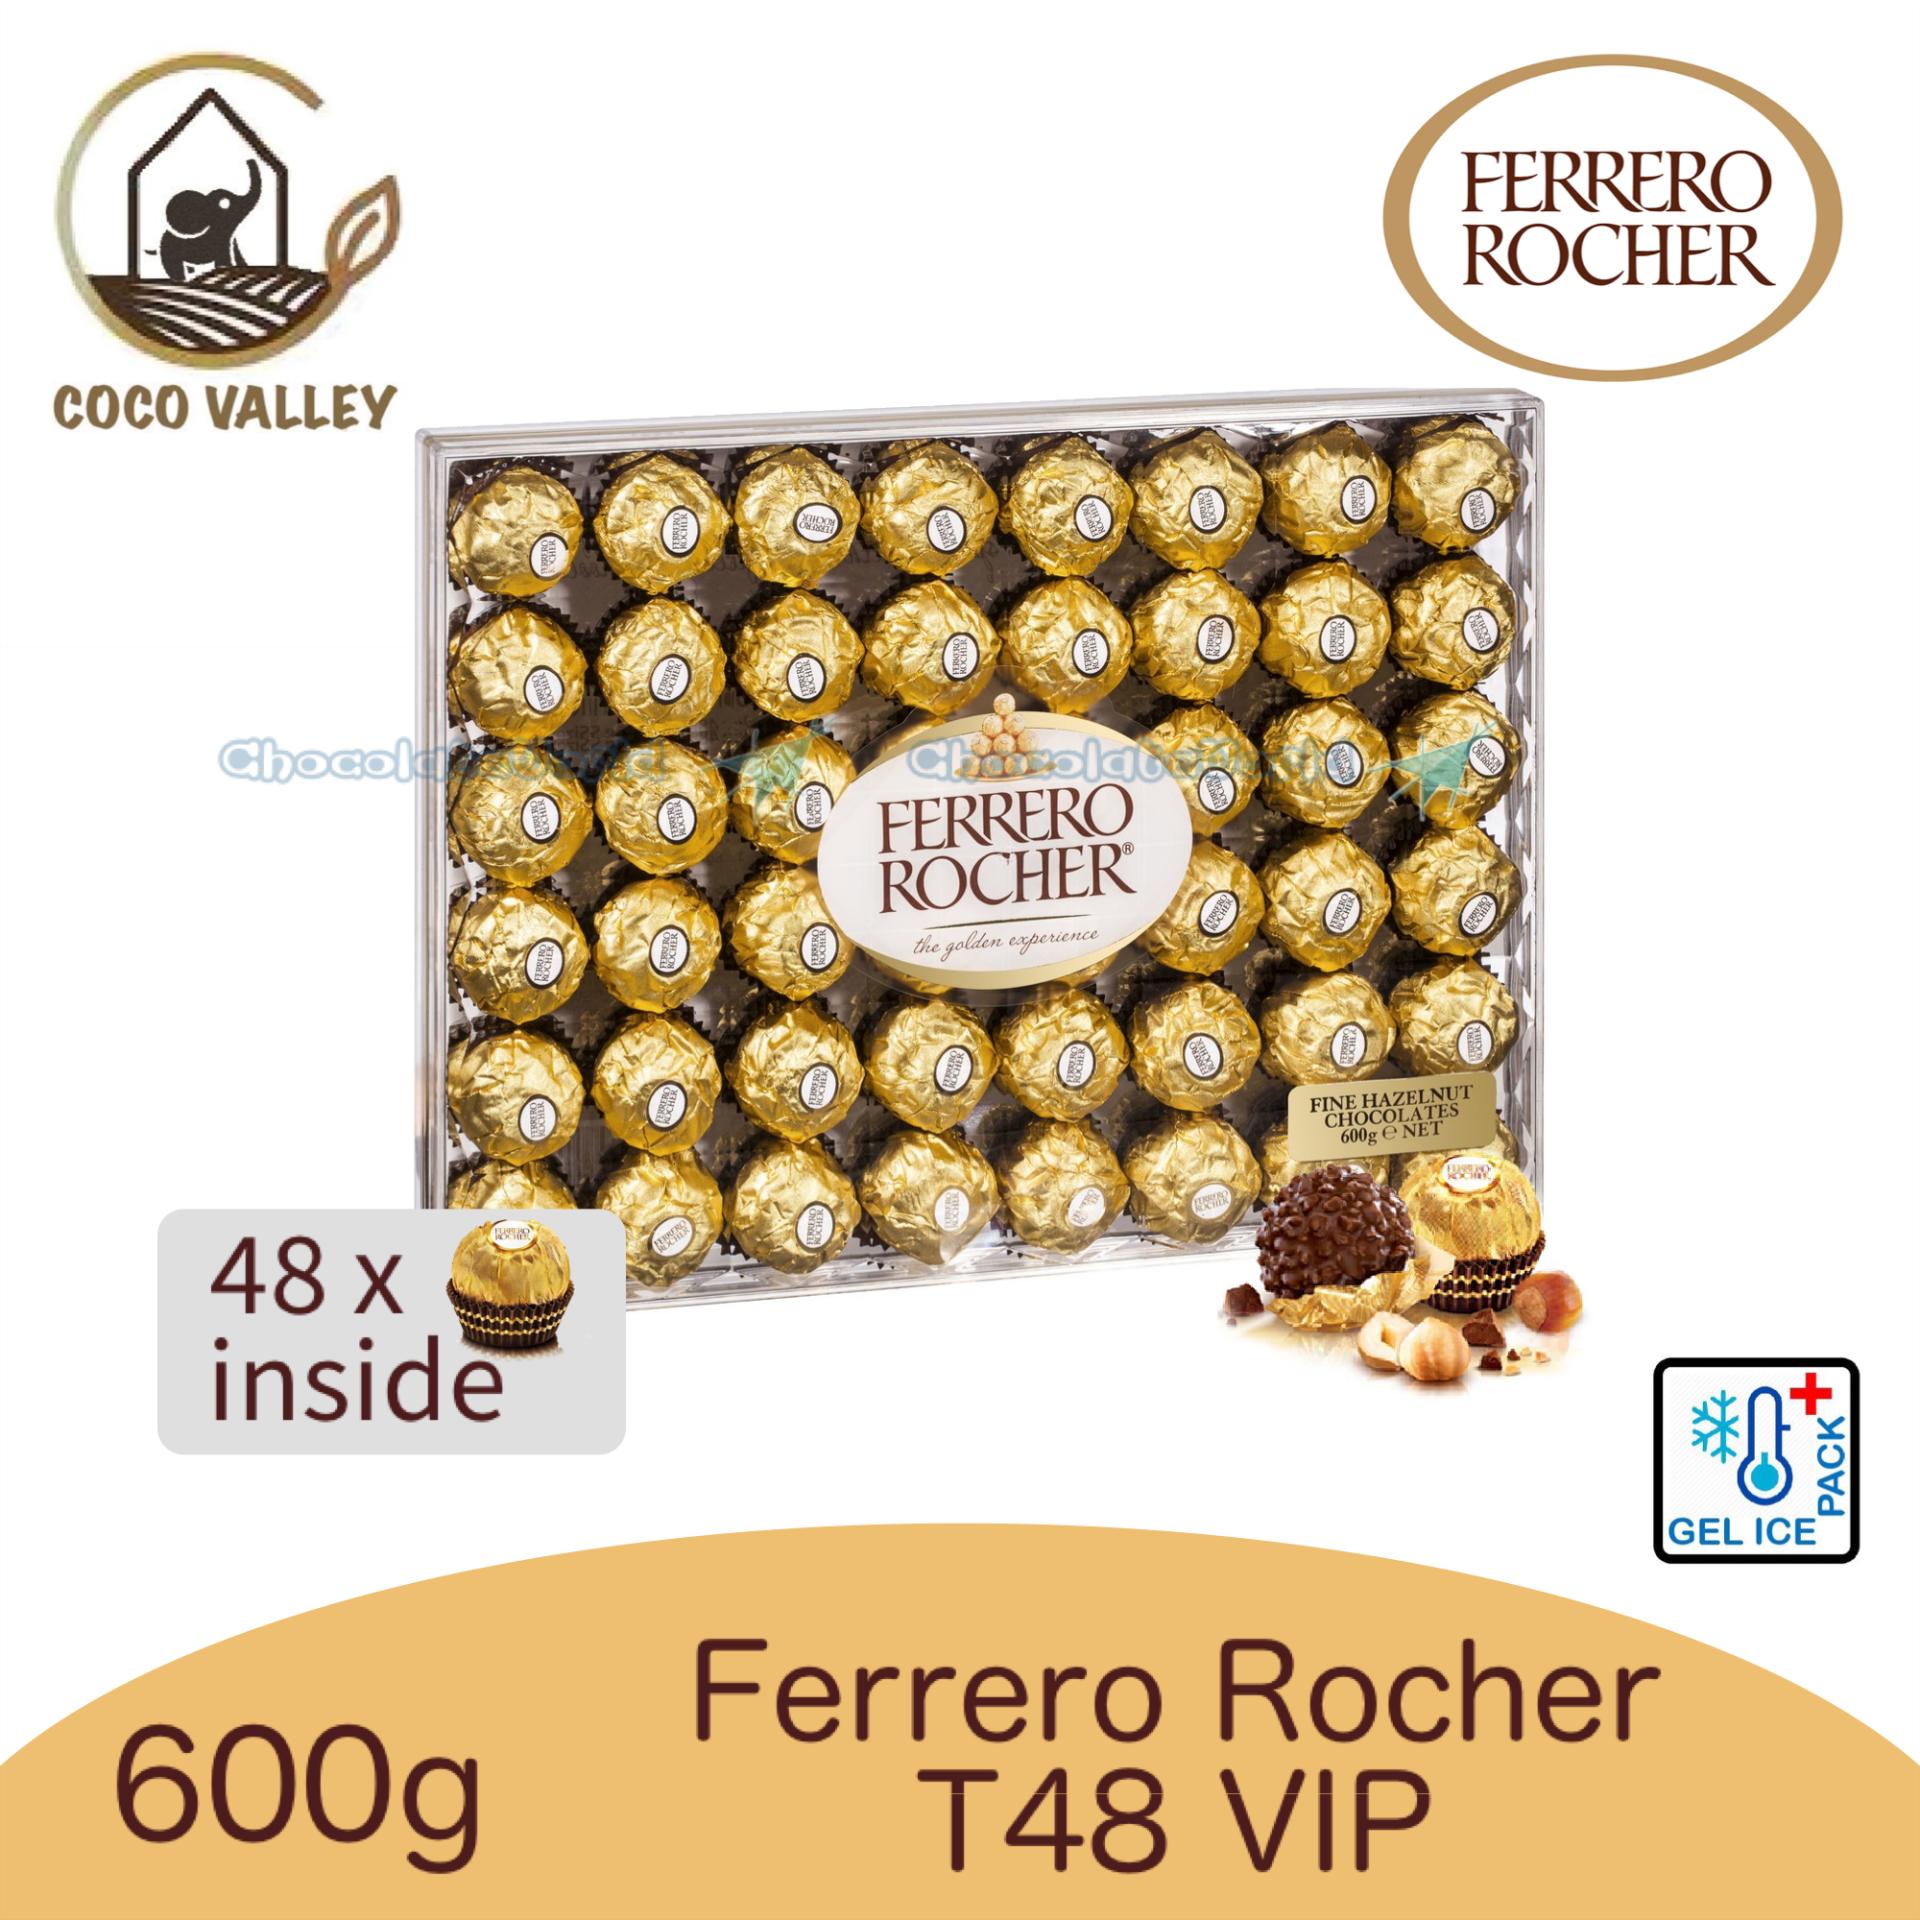 Ferrero Rocher T48 Gift Box 600g (Made in Canada)